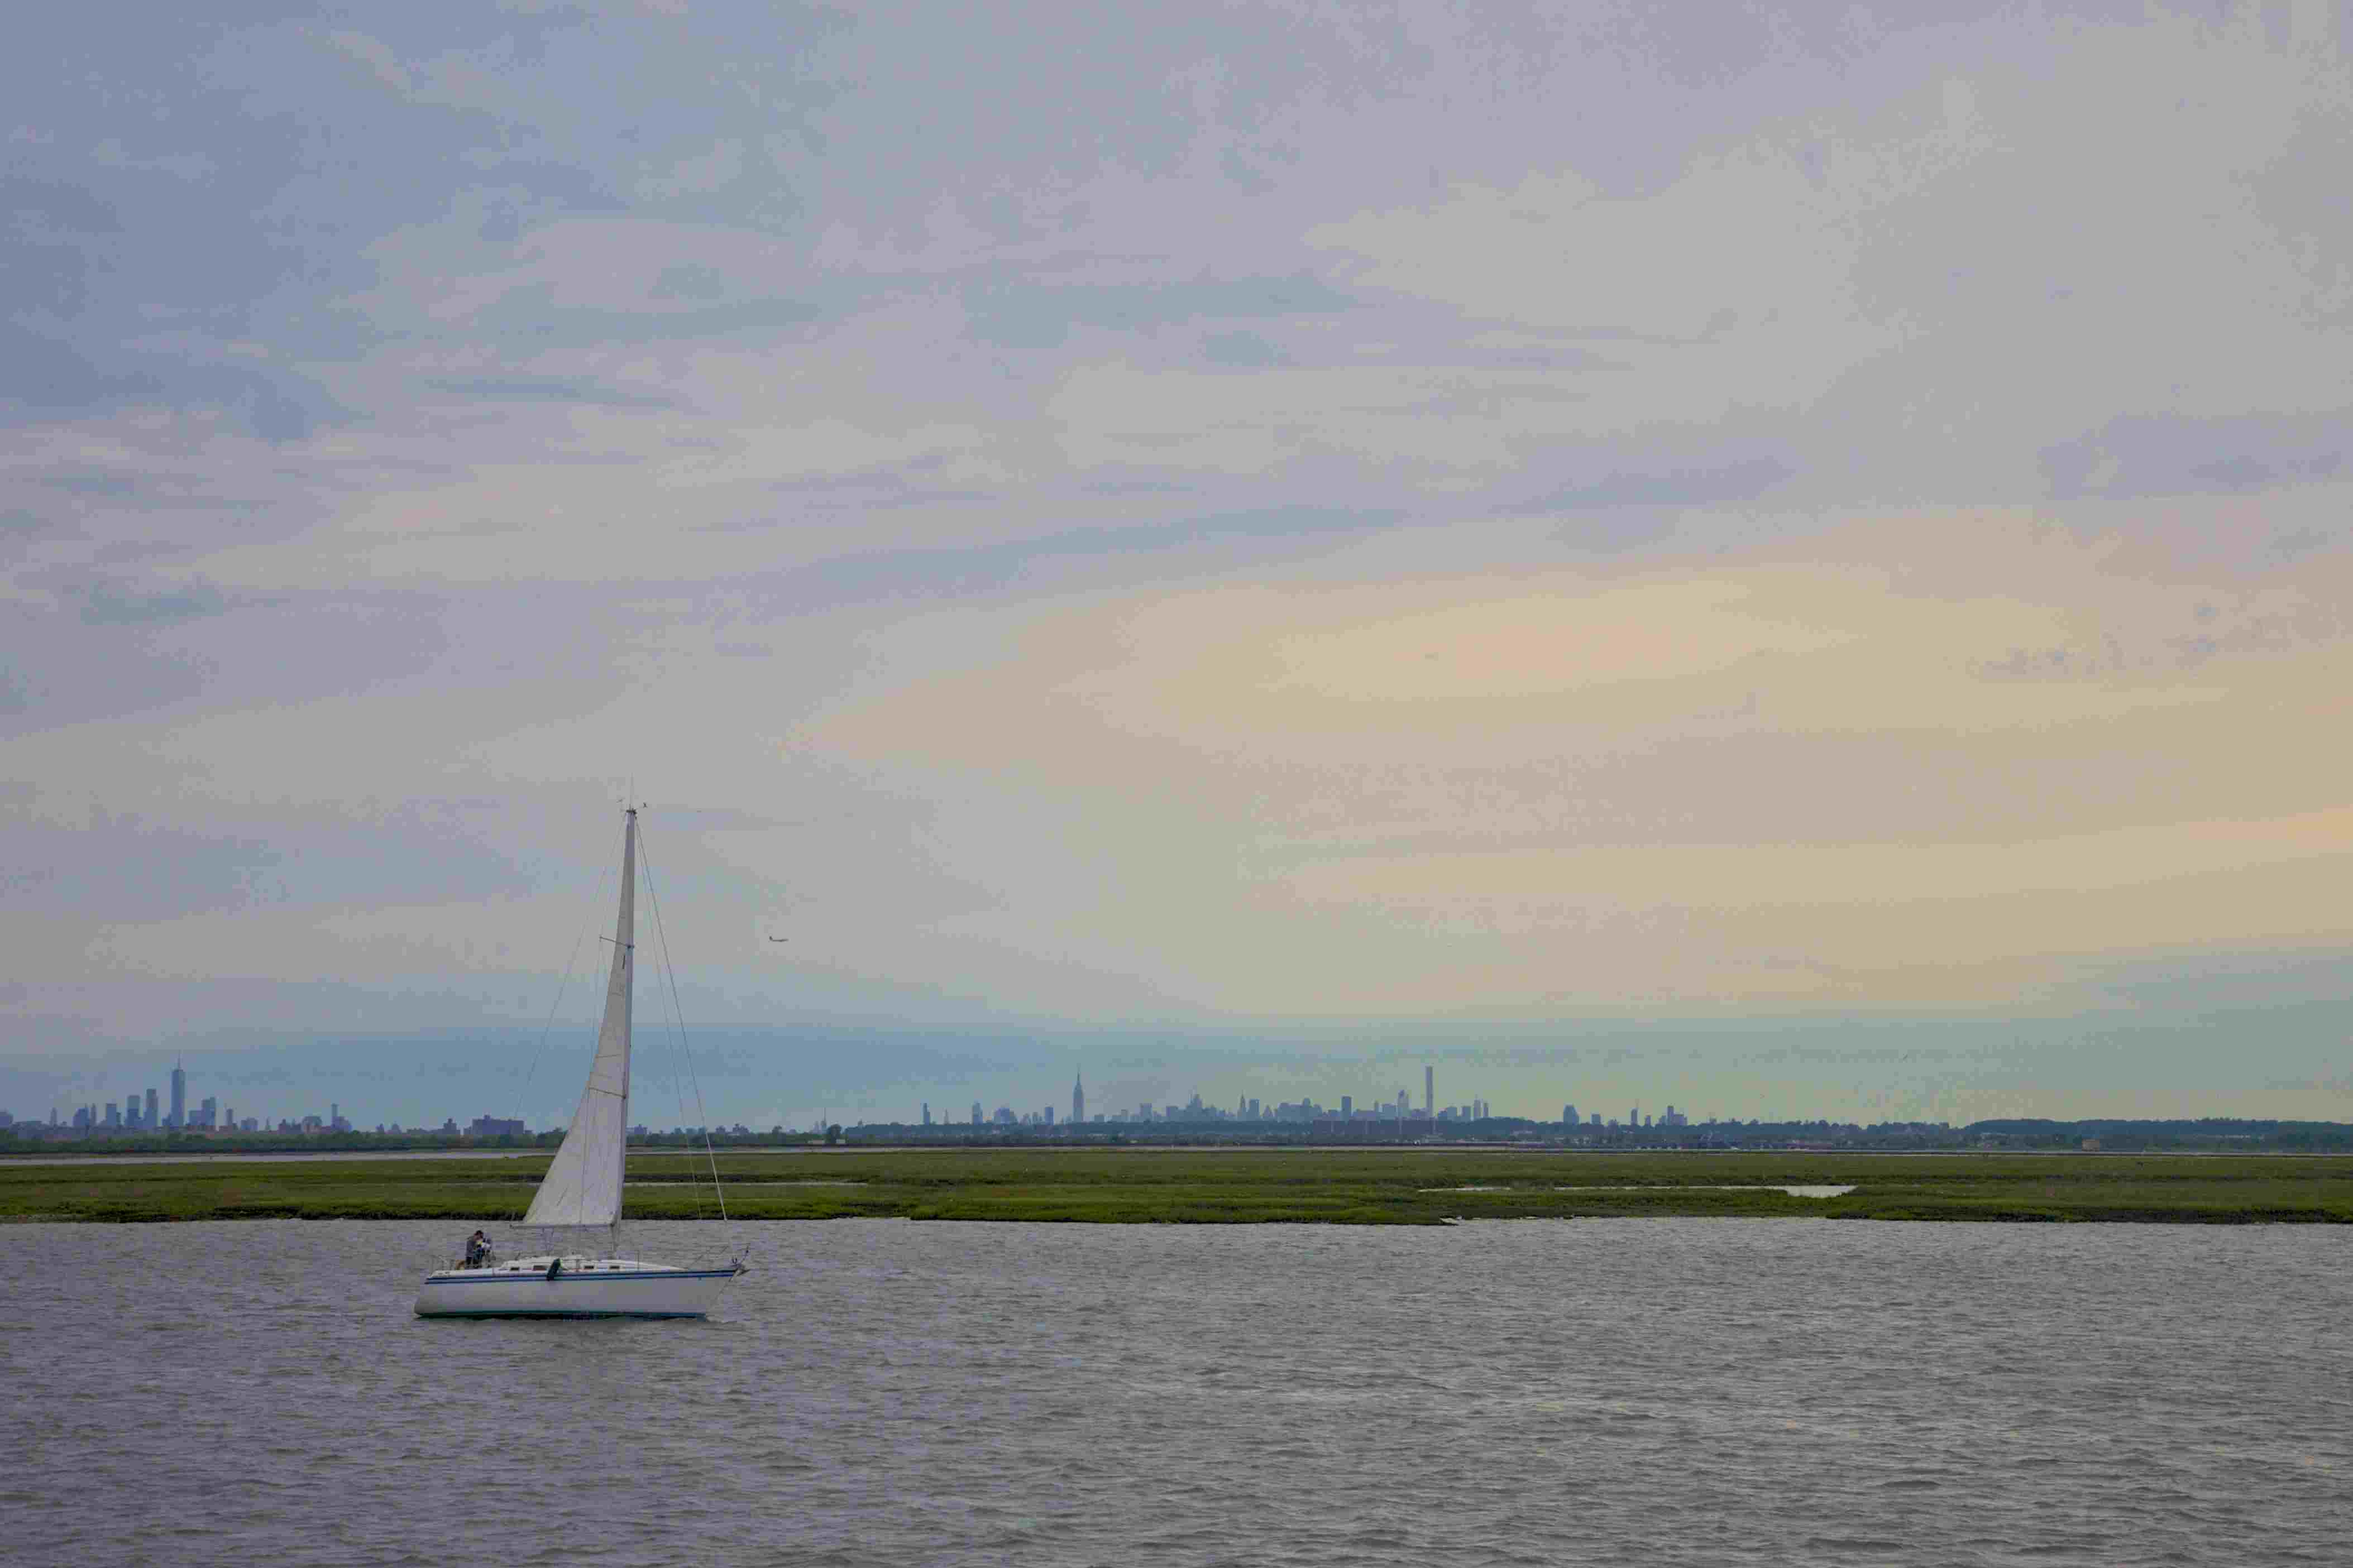 Sailboat near marsh on Jamaica Bay, Queens